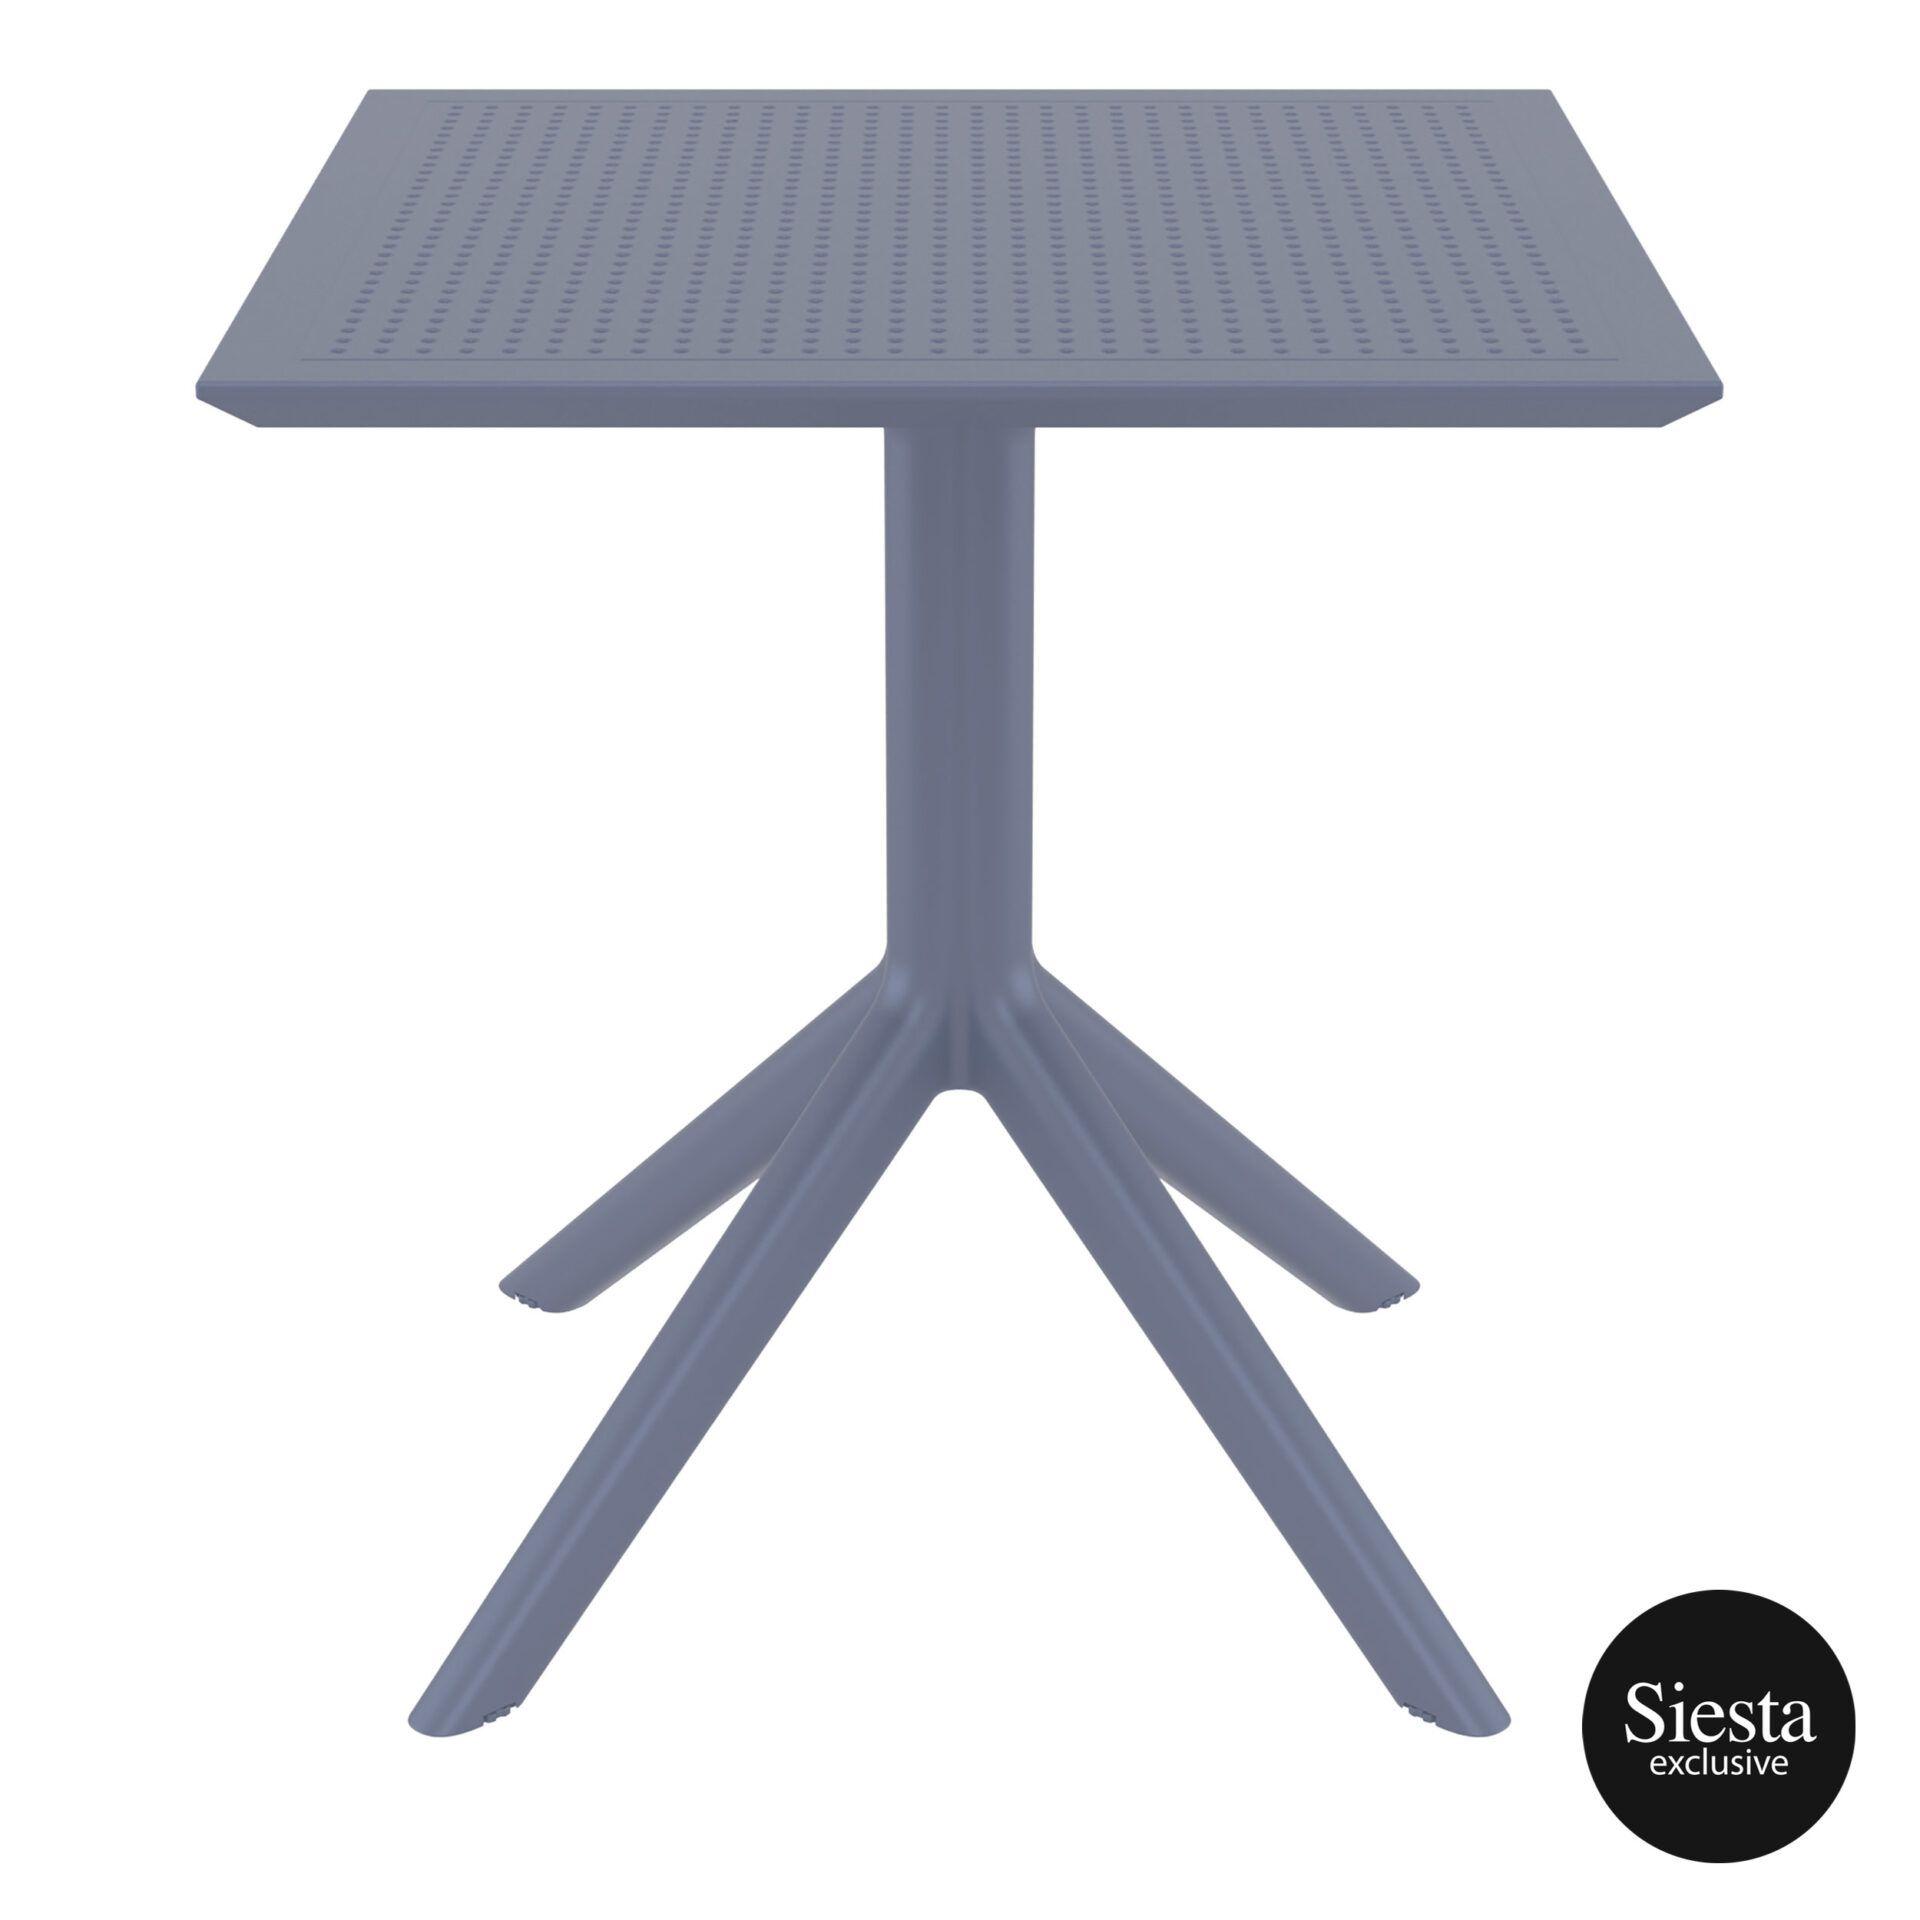 polypropylene outdoor cafe sky table 70 darkgrey front 1